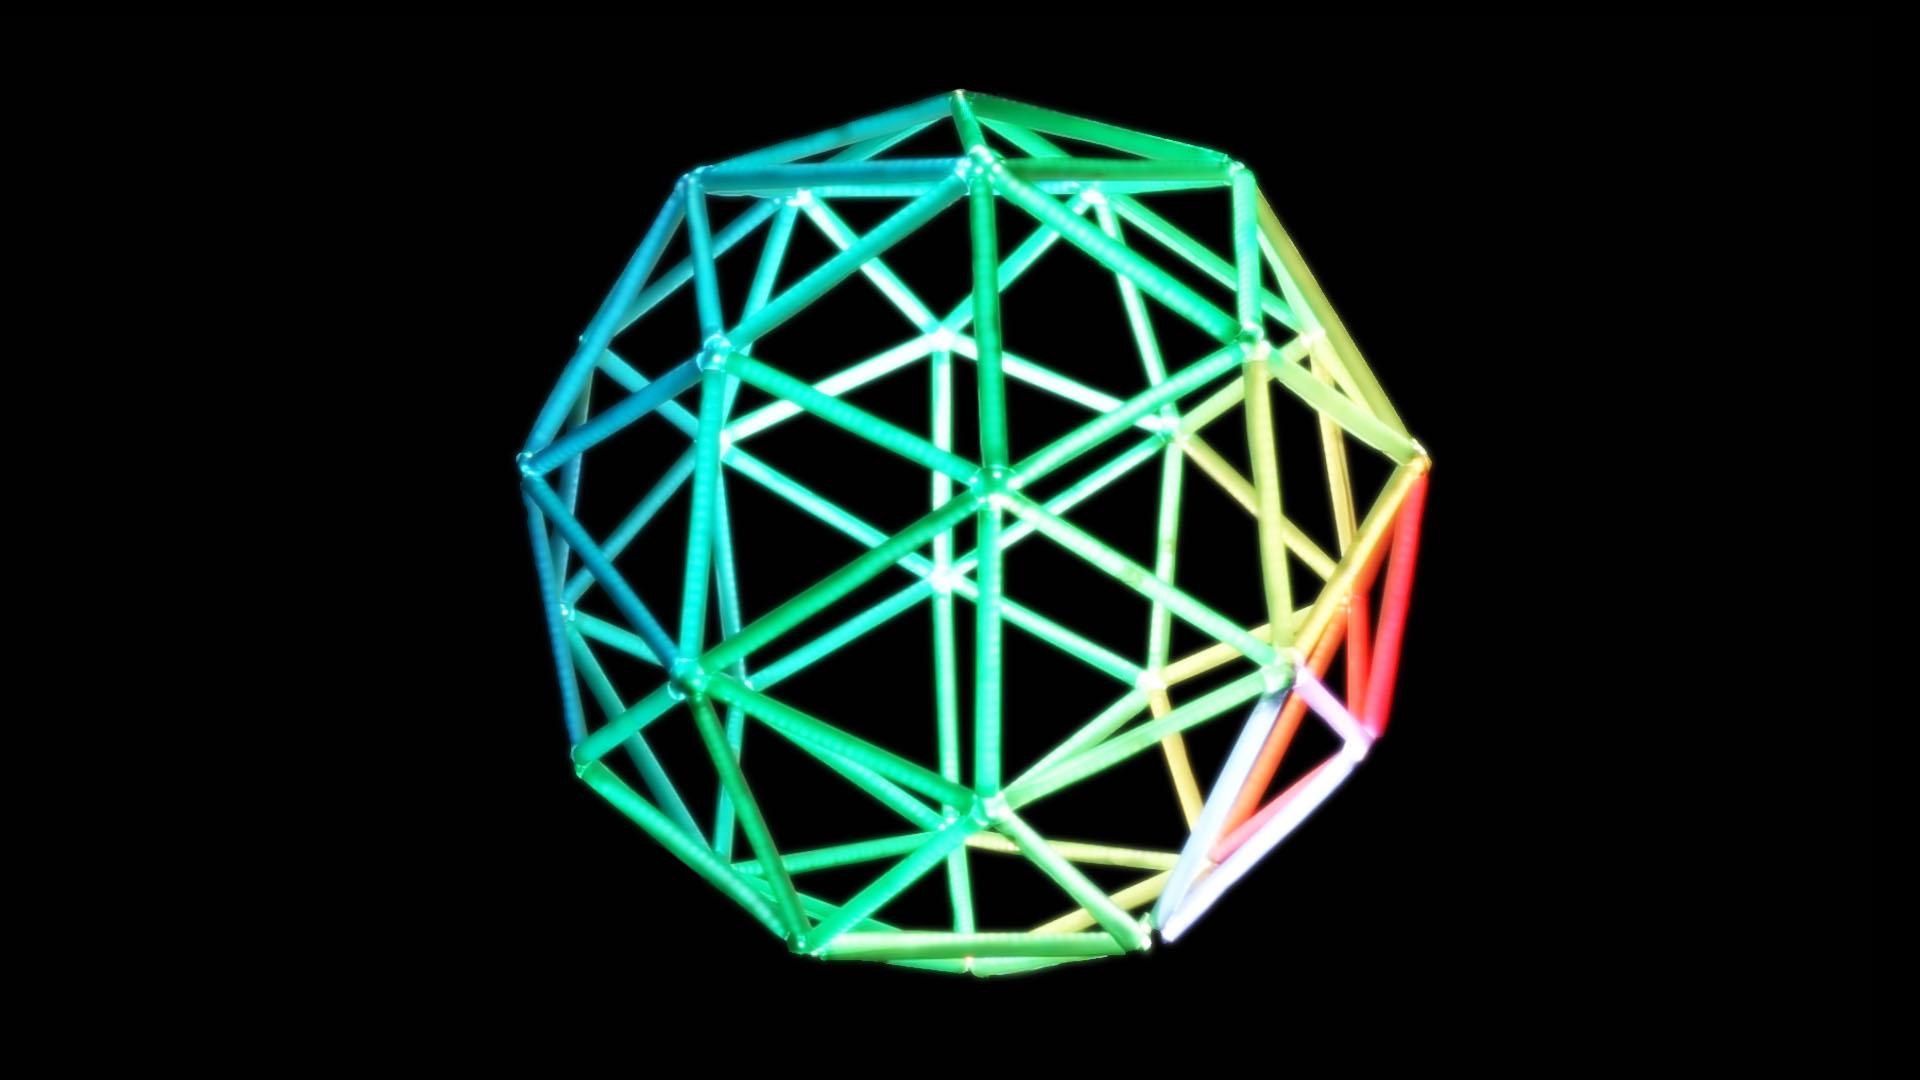 ©ISEA2015: 21st International Symposium on Electronic Art, Tomás Laurenzo and Christian Clark, Barcelona